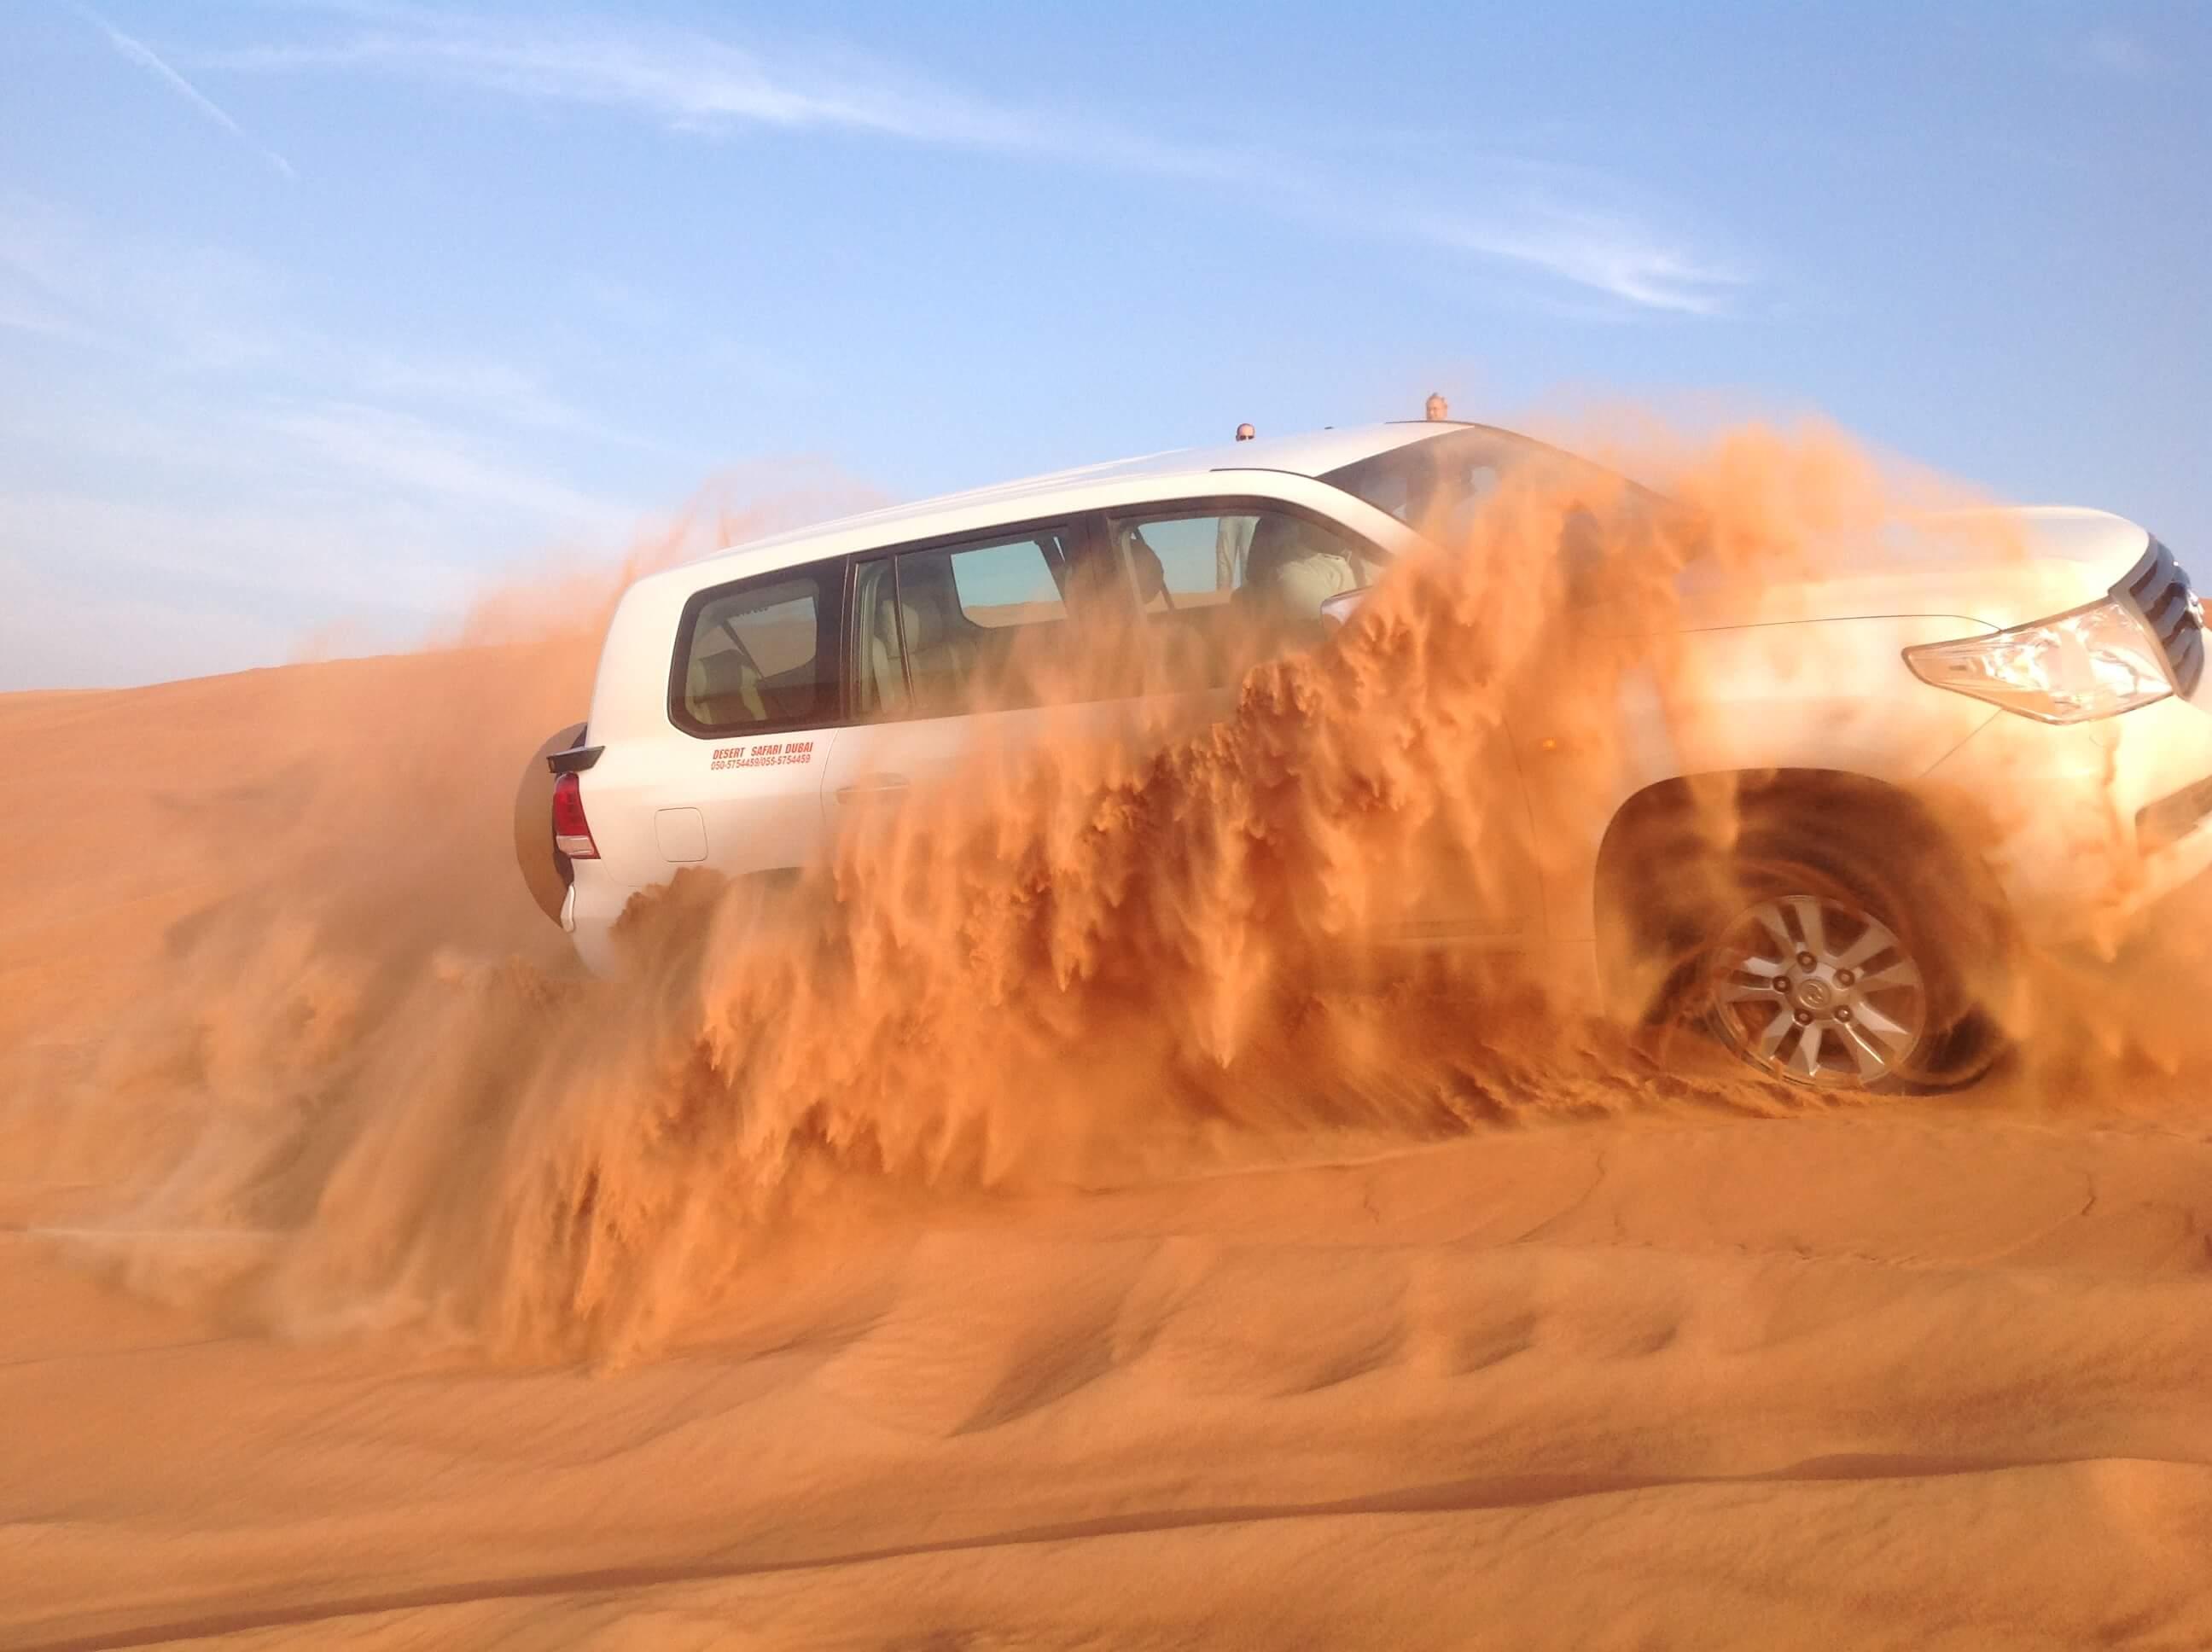 FEEL THE VIBE OF THE MESMERIZING OVERNIGHT DESERT SAFARI